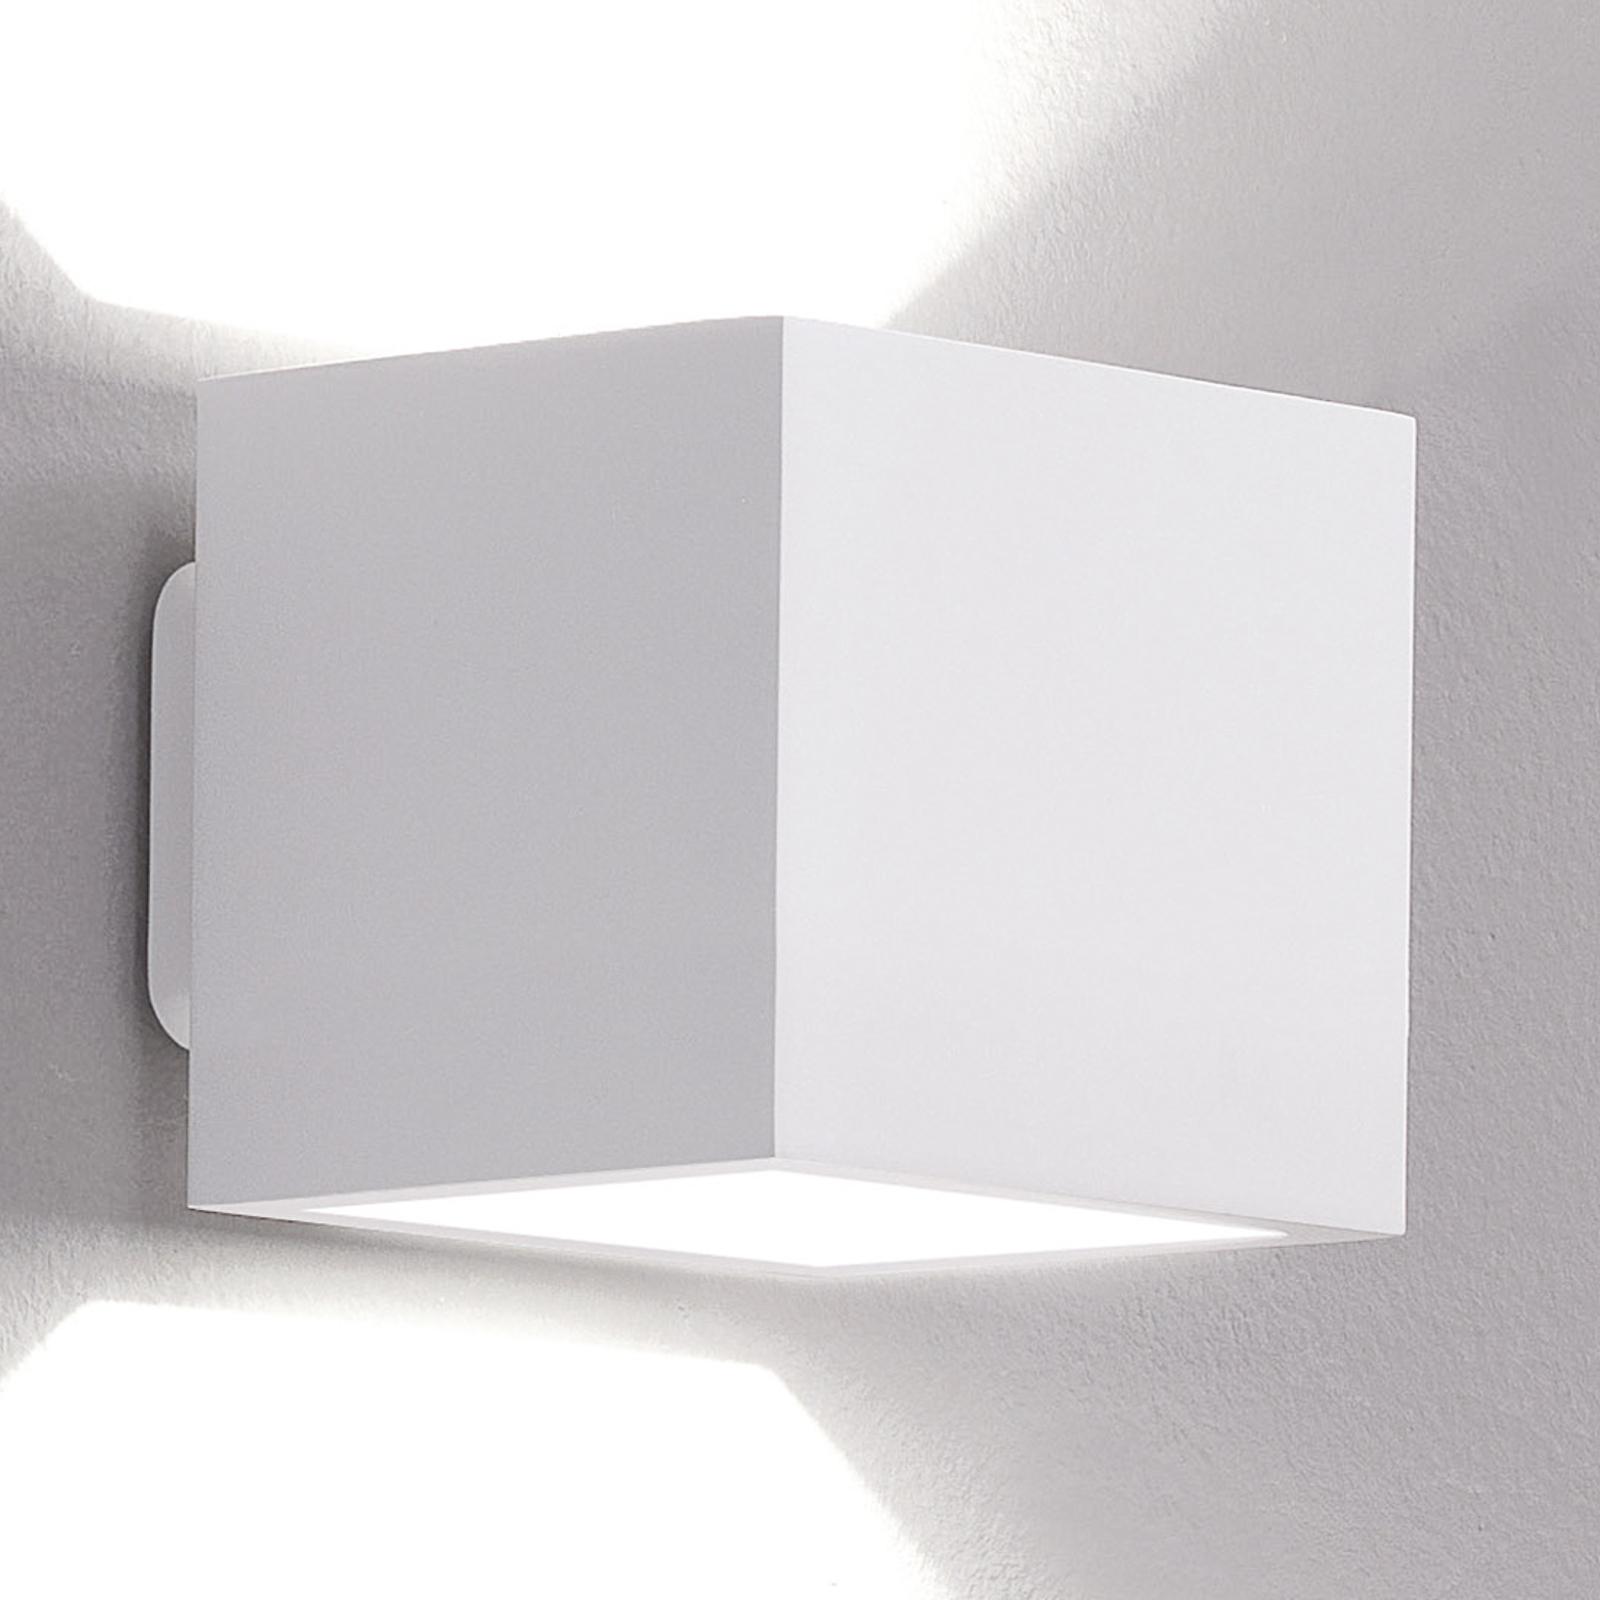 ICONE Cubò lampa sufitowa LED, 10 W, biała